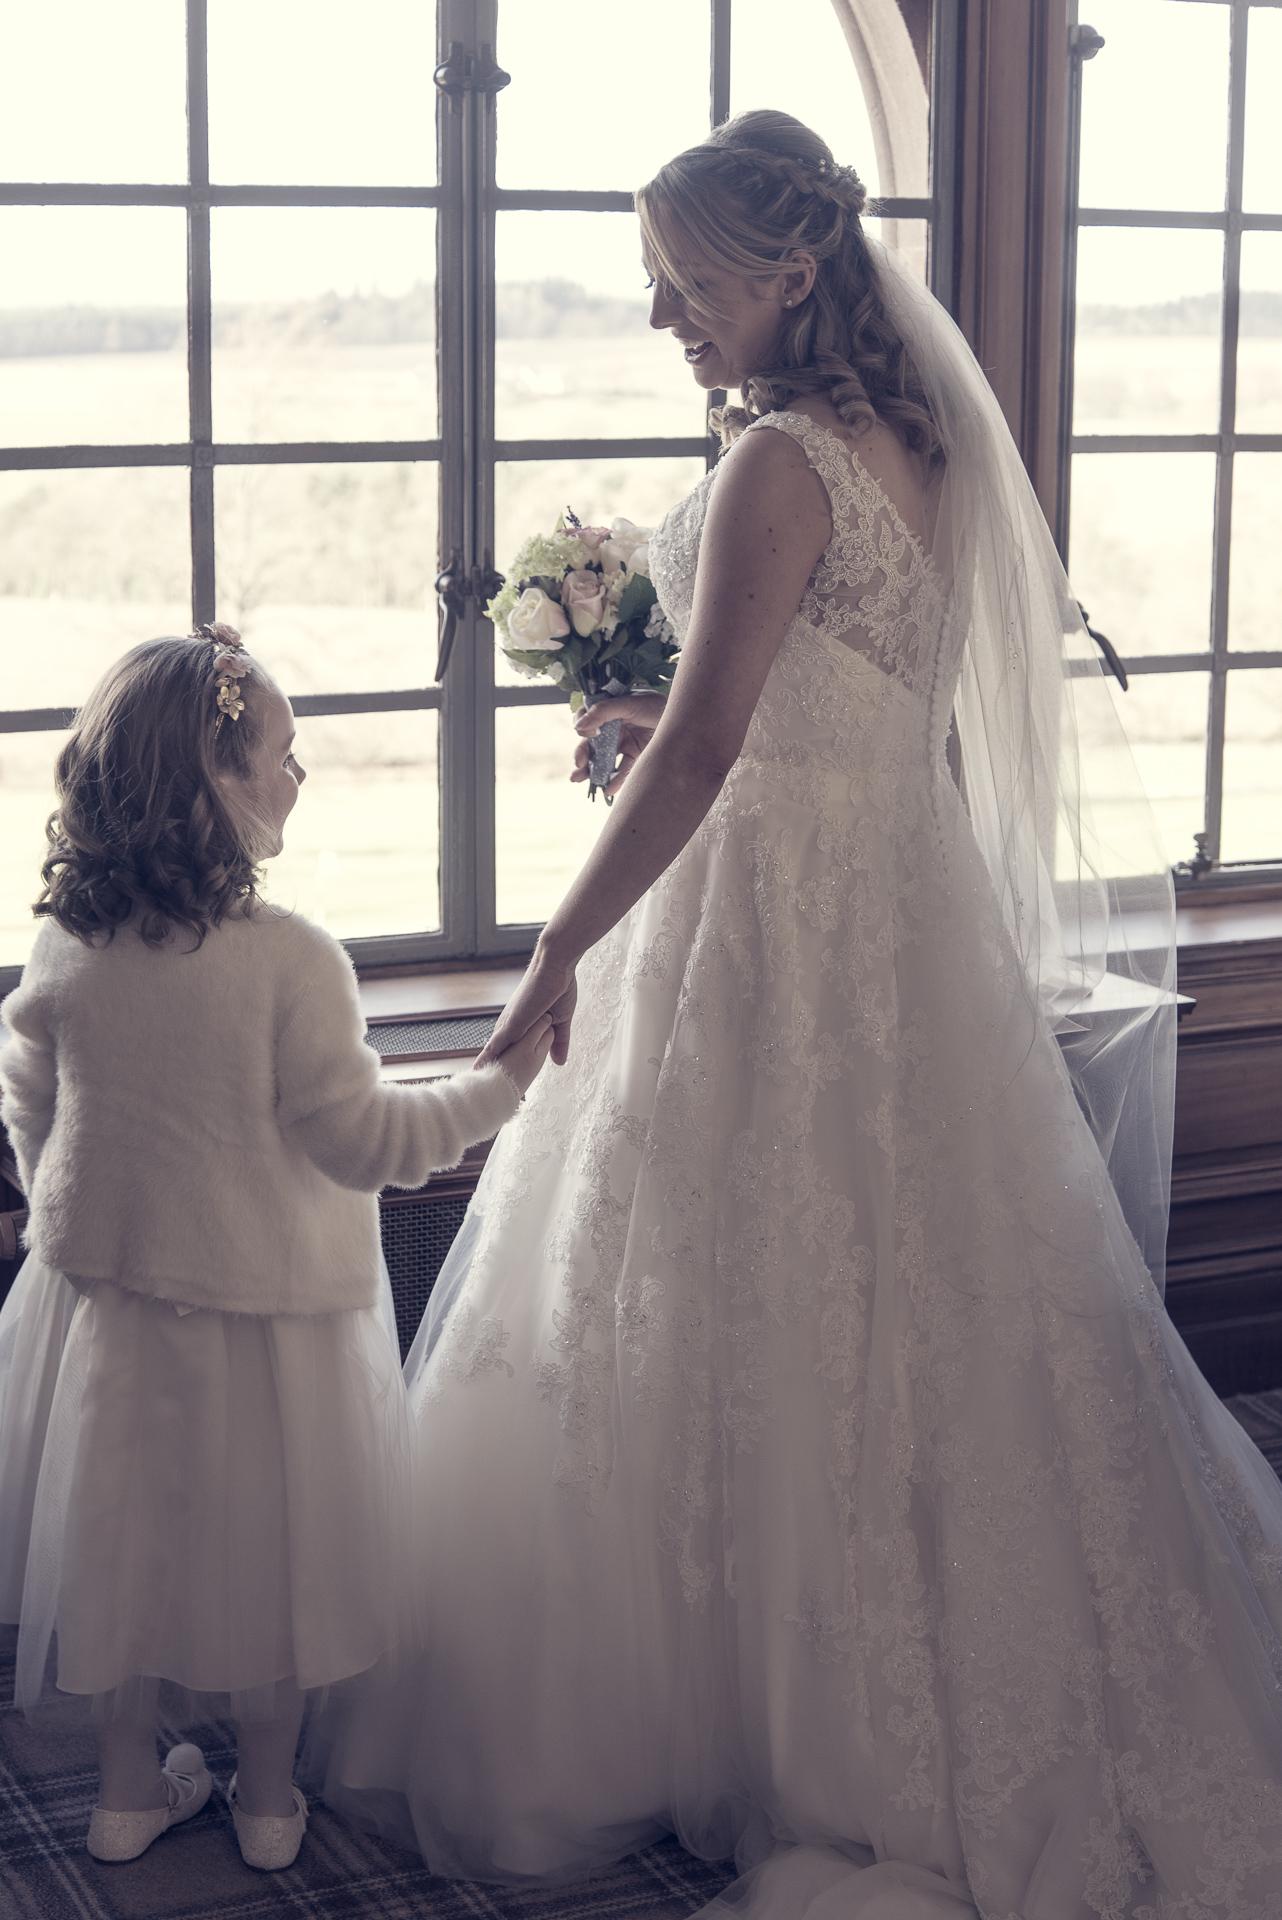 Brian-Lynda-wedding-Murrayshall-Simon-murray